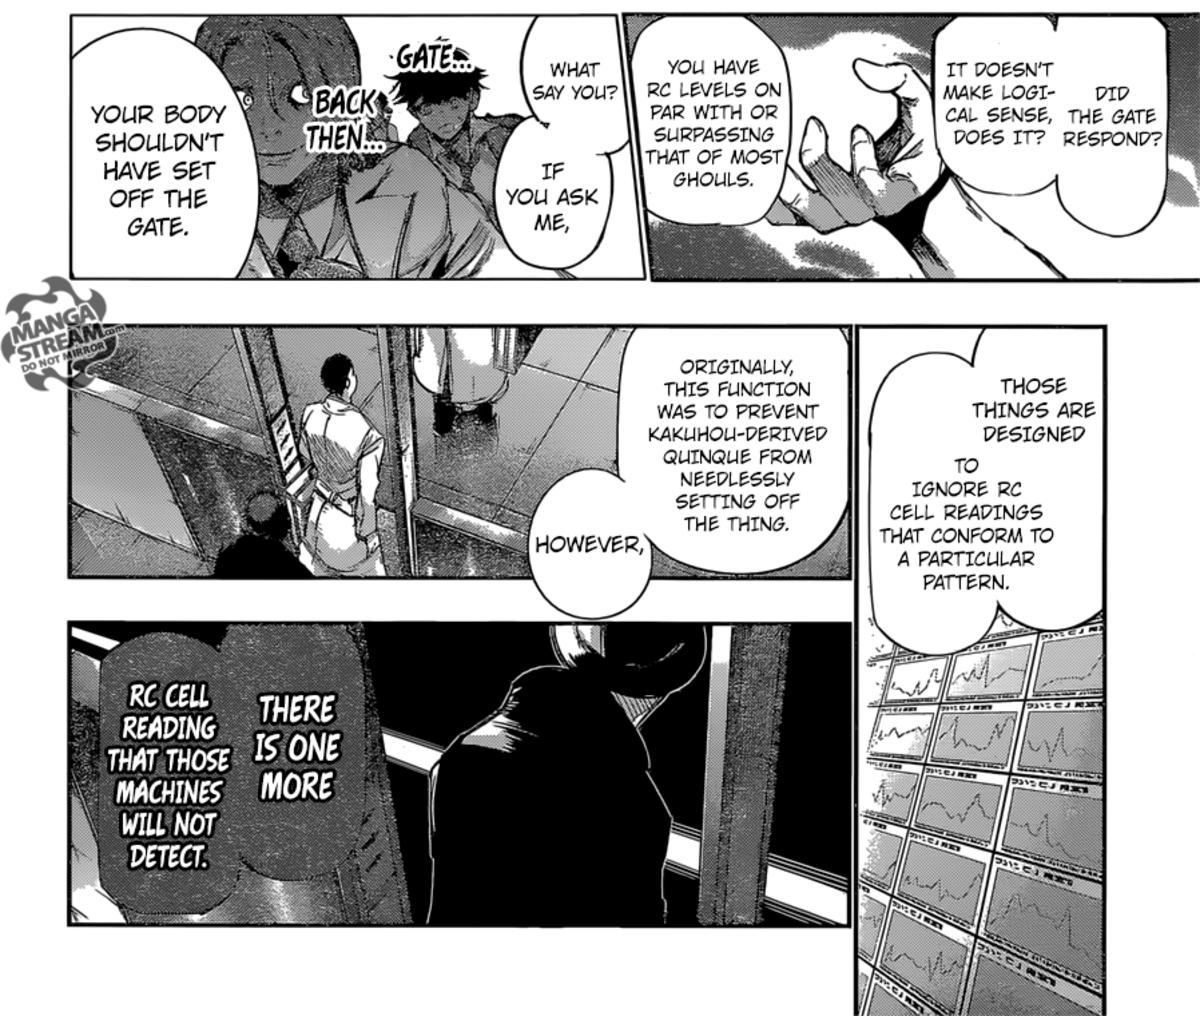 Eto explaining why the RC gate didn't detect Kaneki.